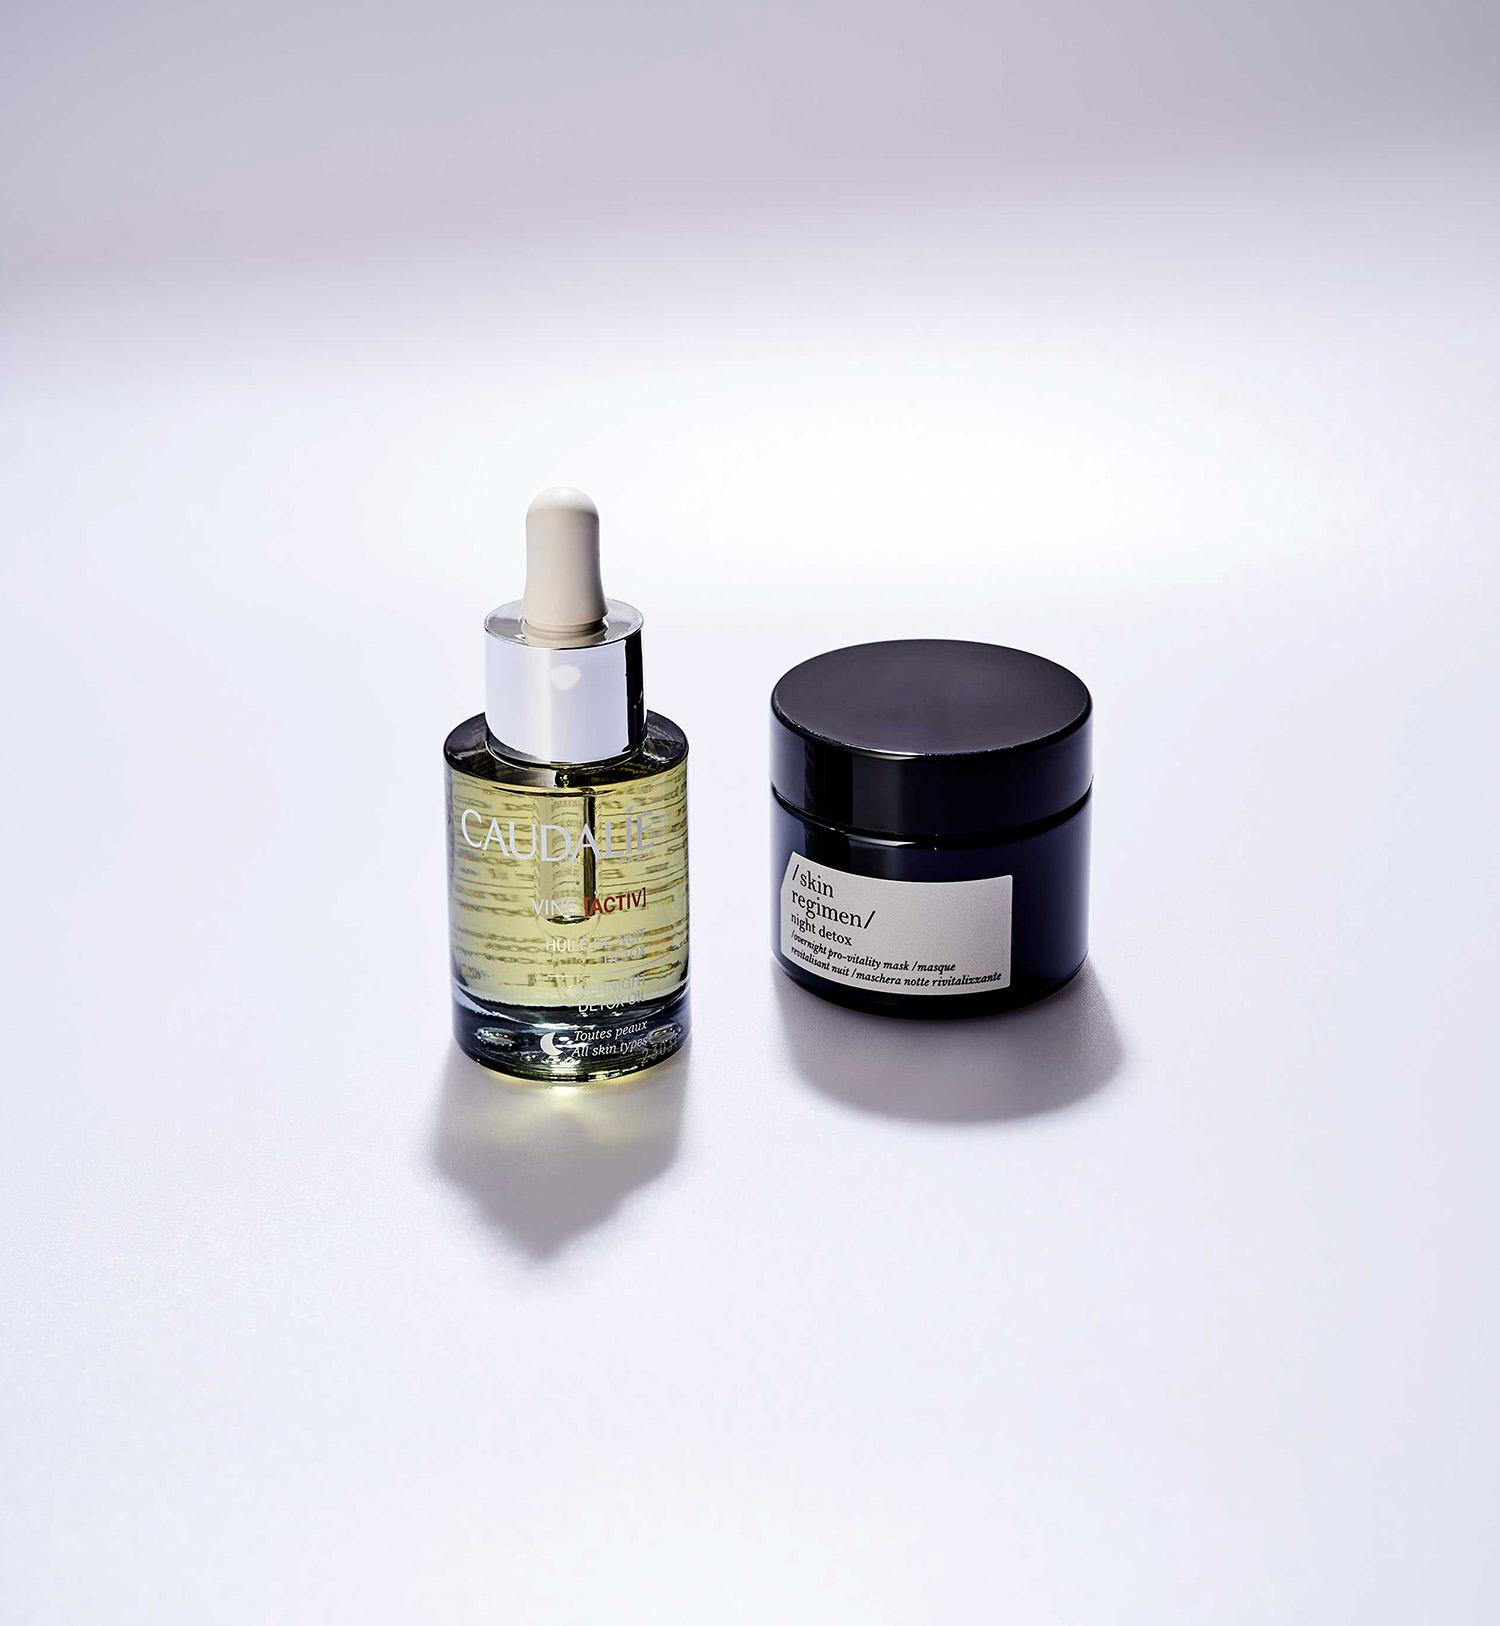 Ночное детокс-масло длялица Vineactiv Huile de Nuit Detox, Caudalie  Ночная детокс-маска Night Detox, Skin Regimen